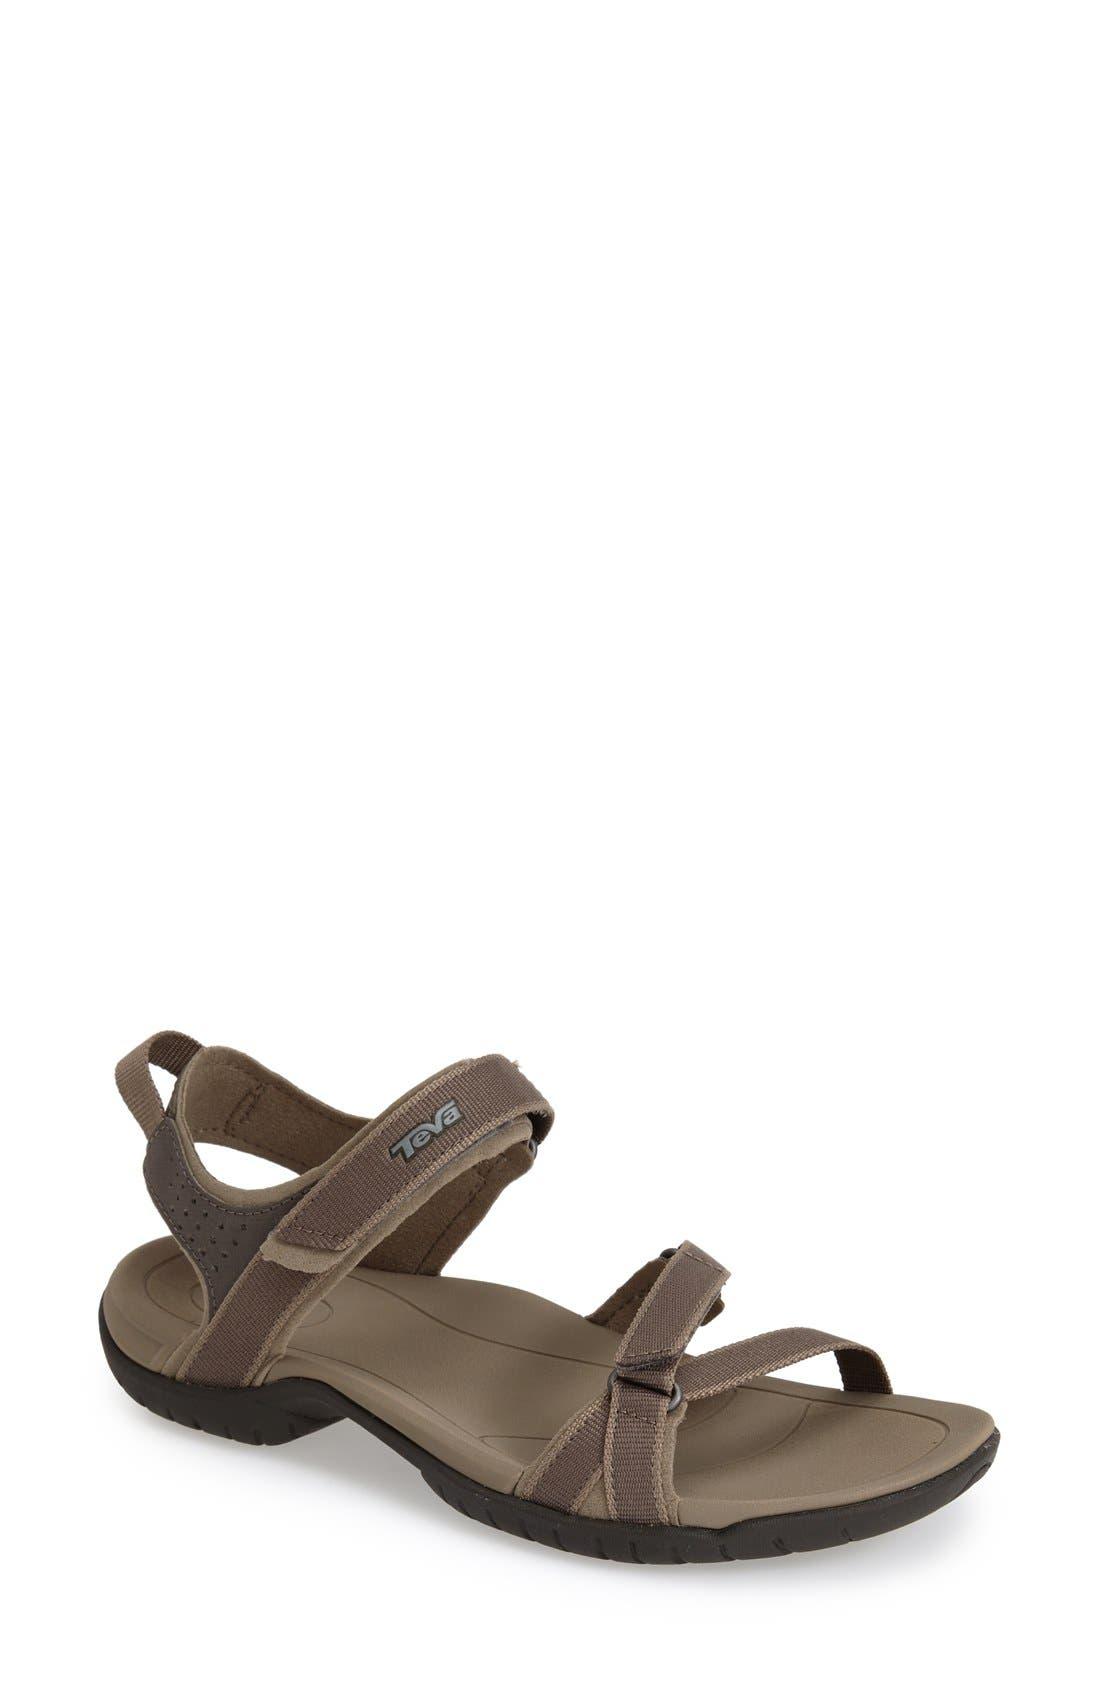 'Verra' Sandal,                         Main,                         color, Bungee Cord